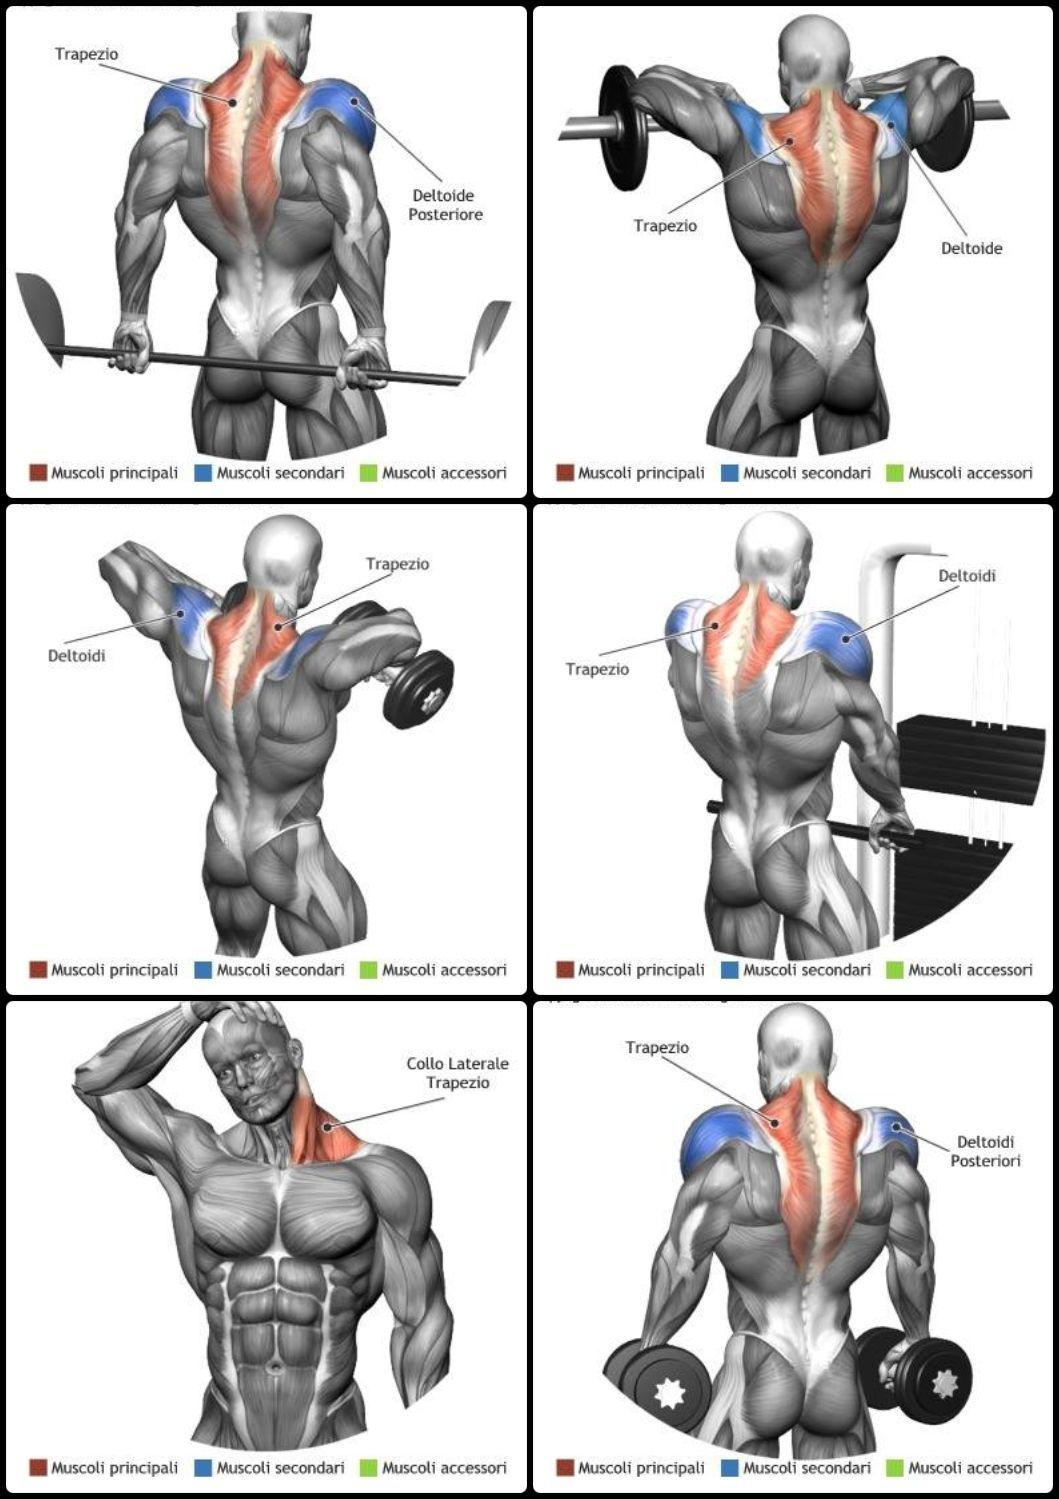 10 Best Muscle-Building Shoulder Exercises To Build 3D Shoulders Shoulder workout Traps